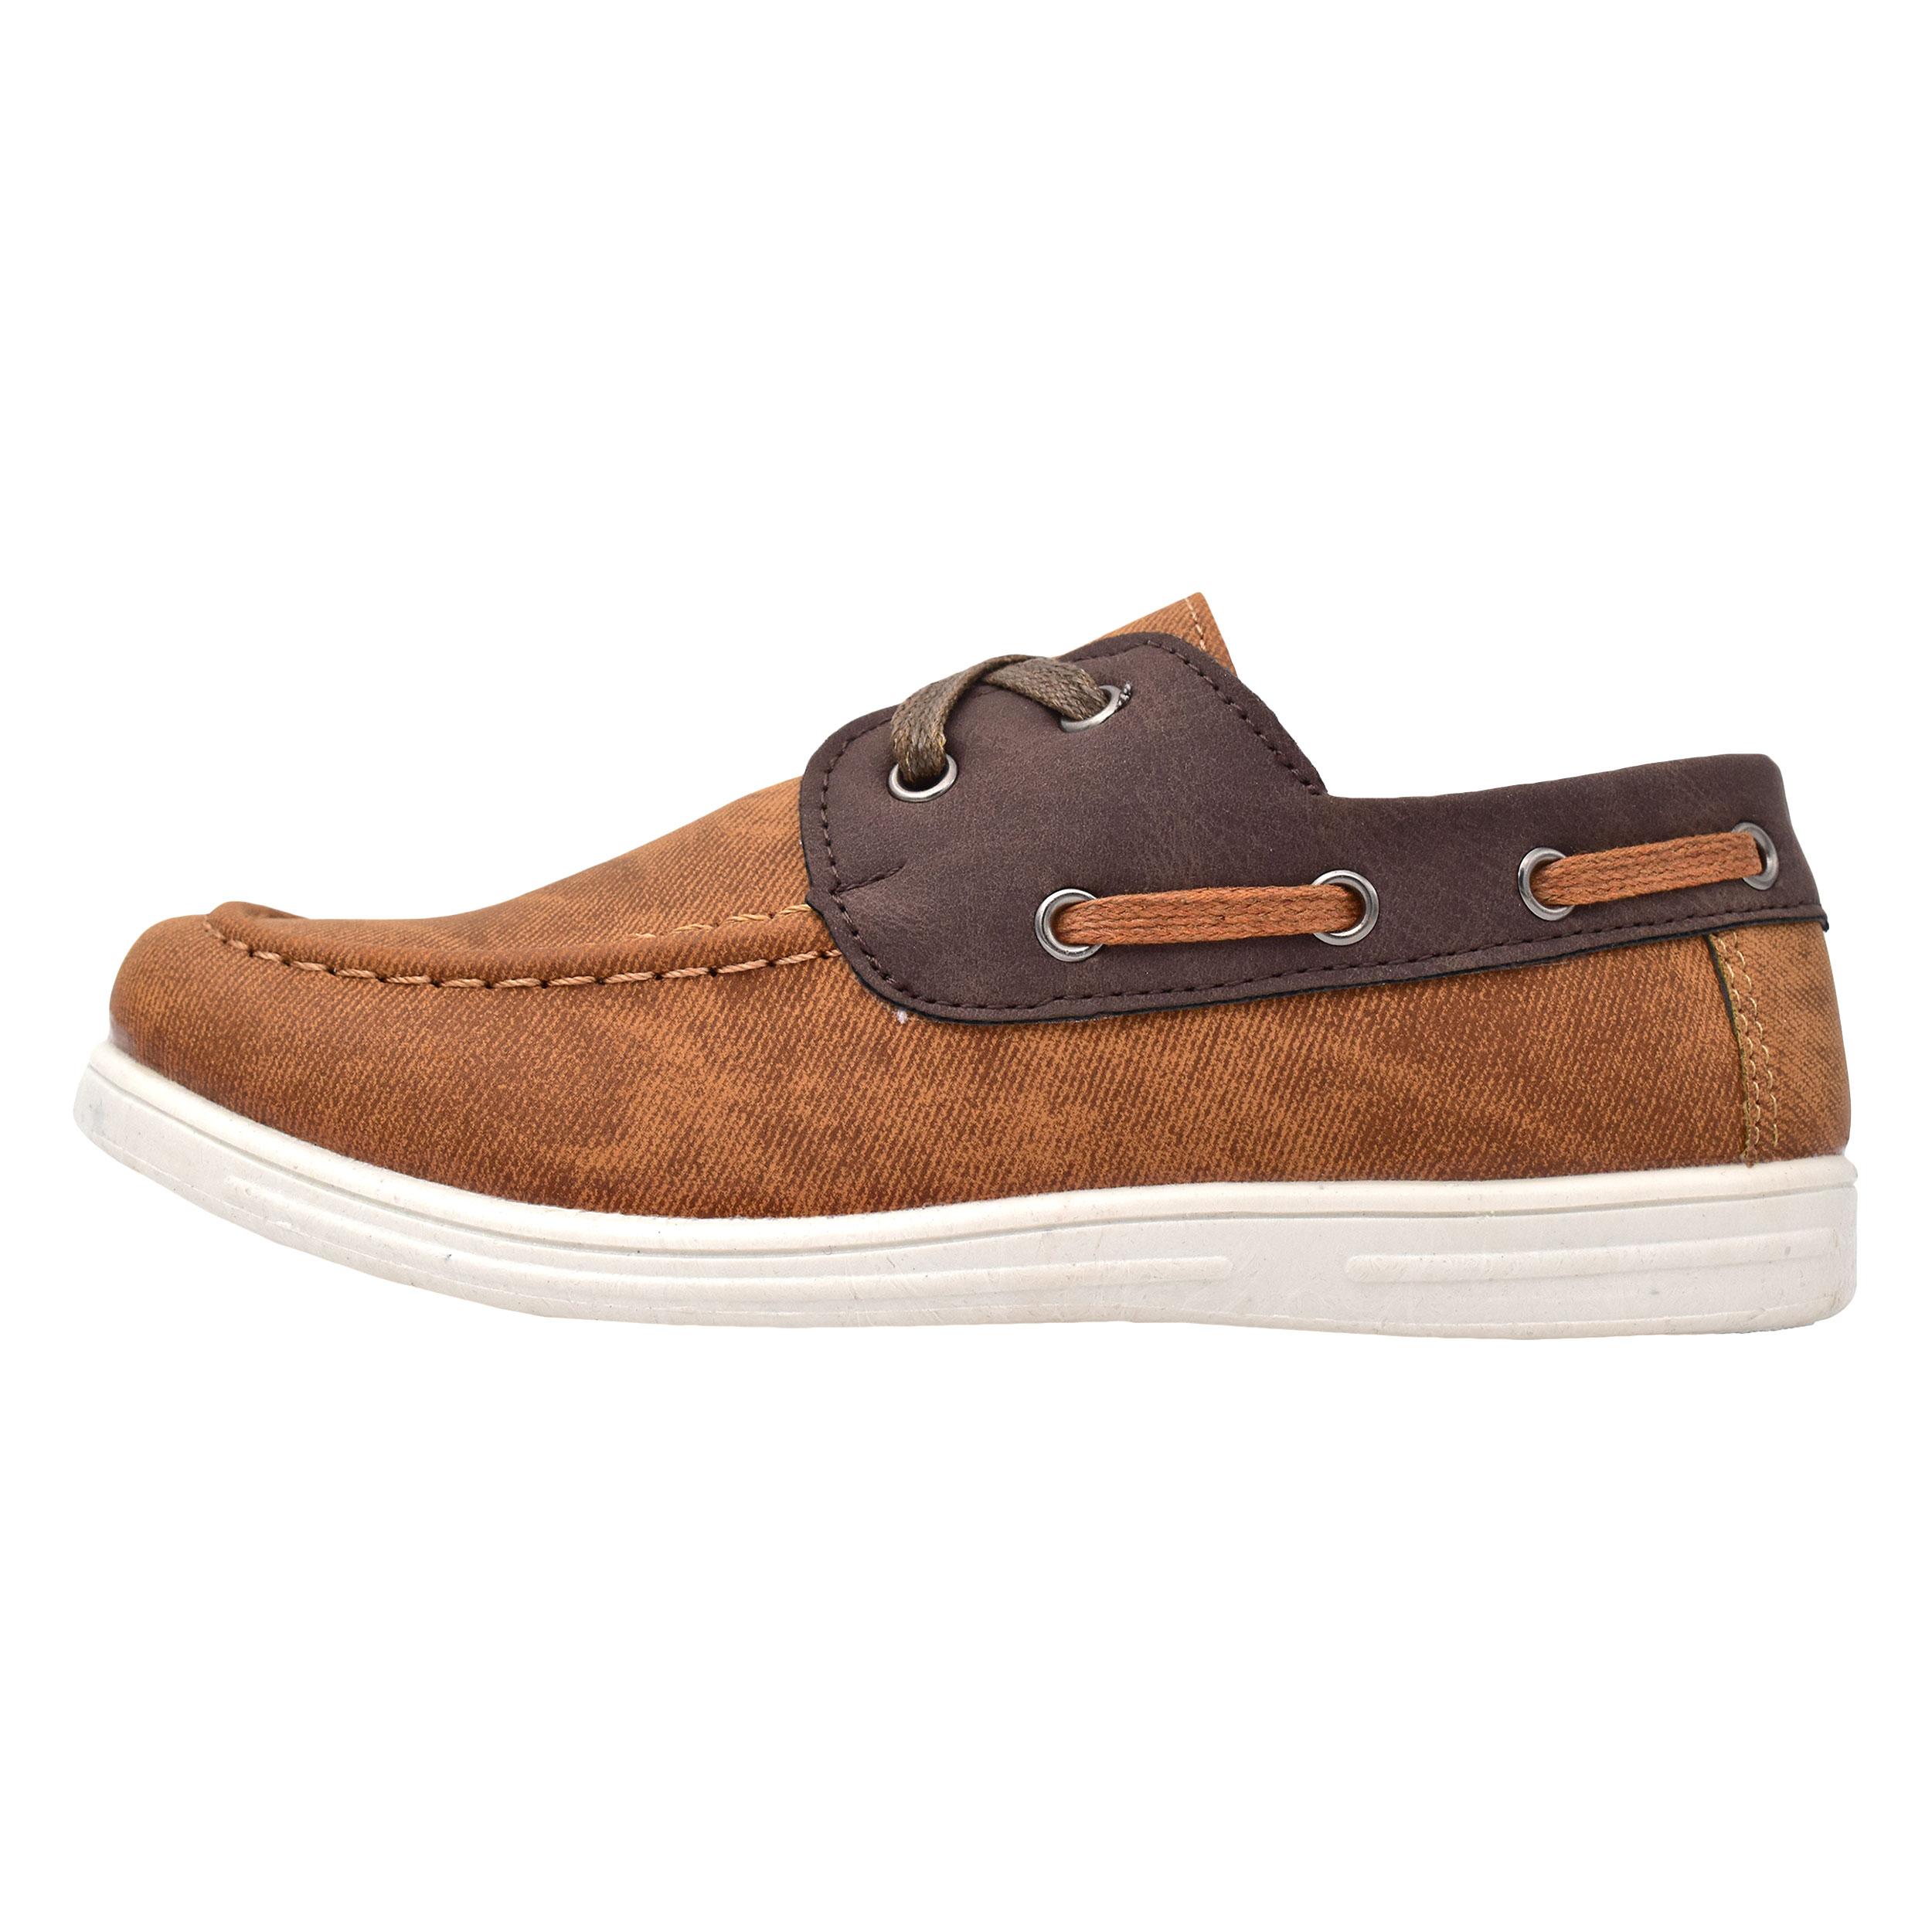 کفش پسرانه پاما مدل KLJ کد G1244